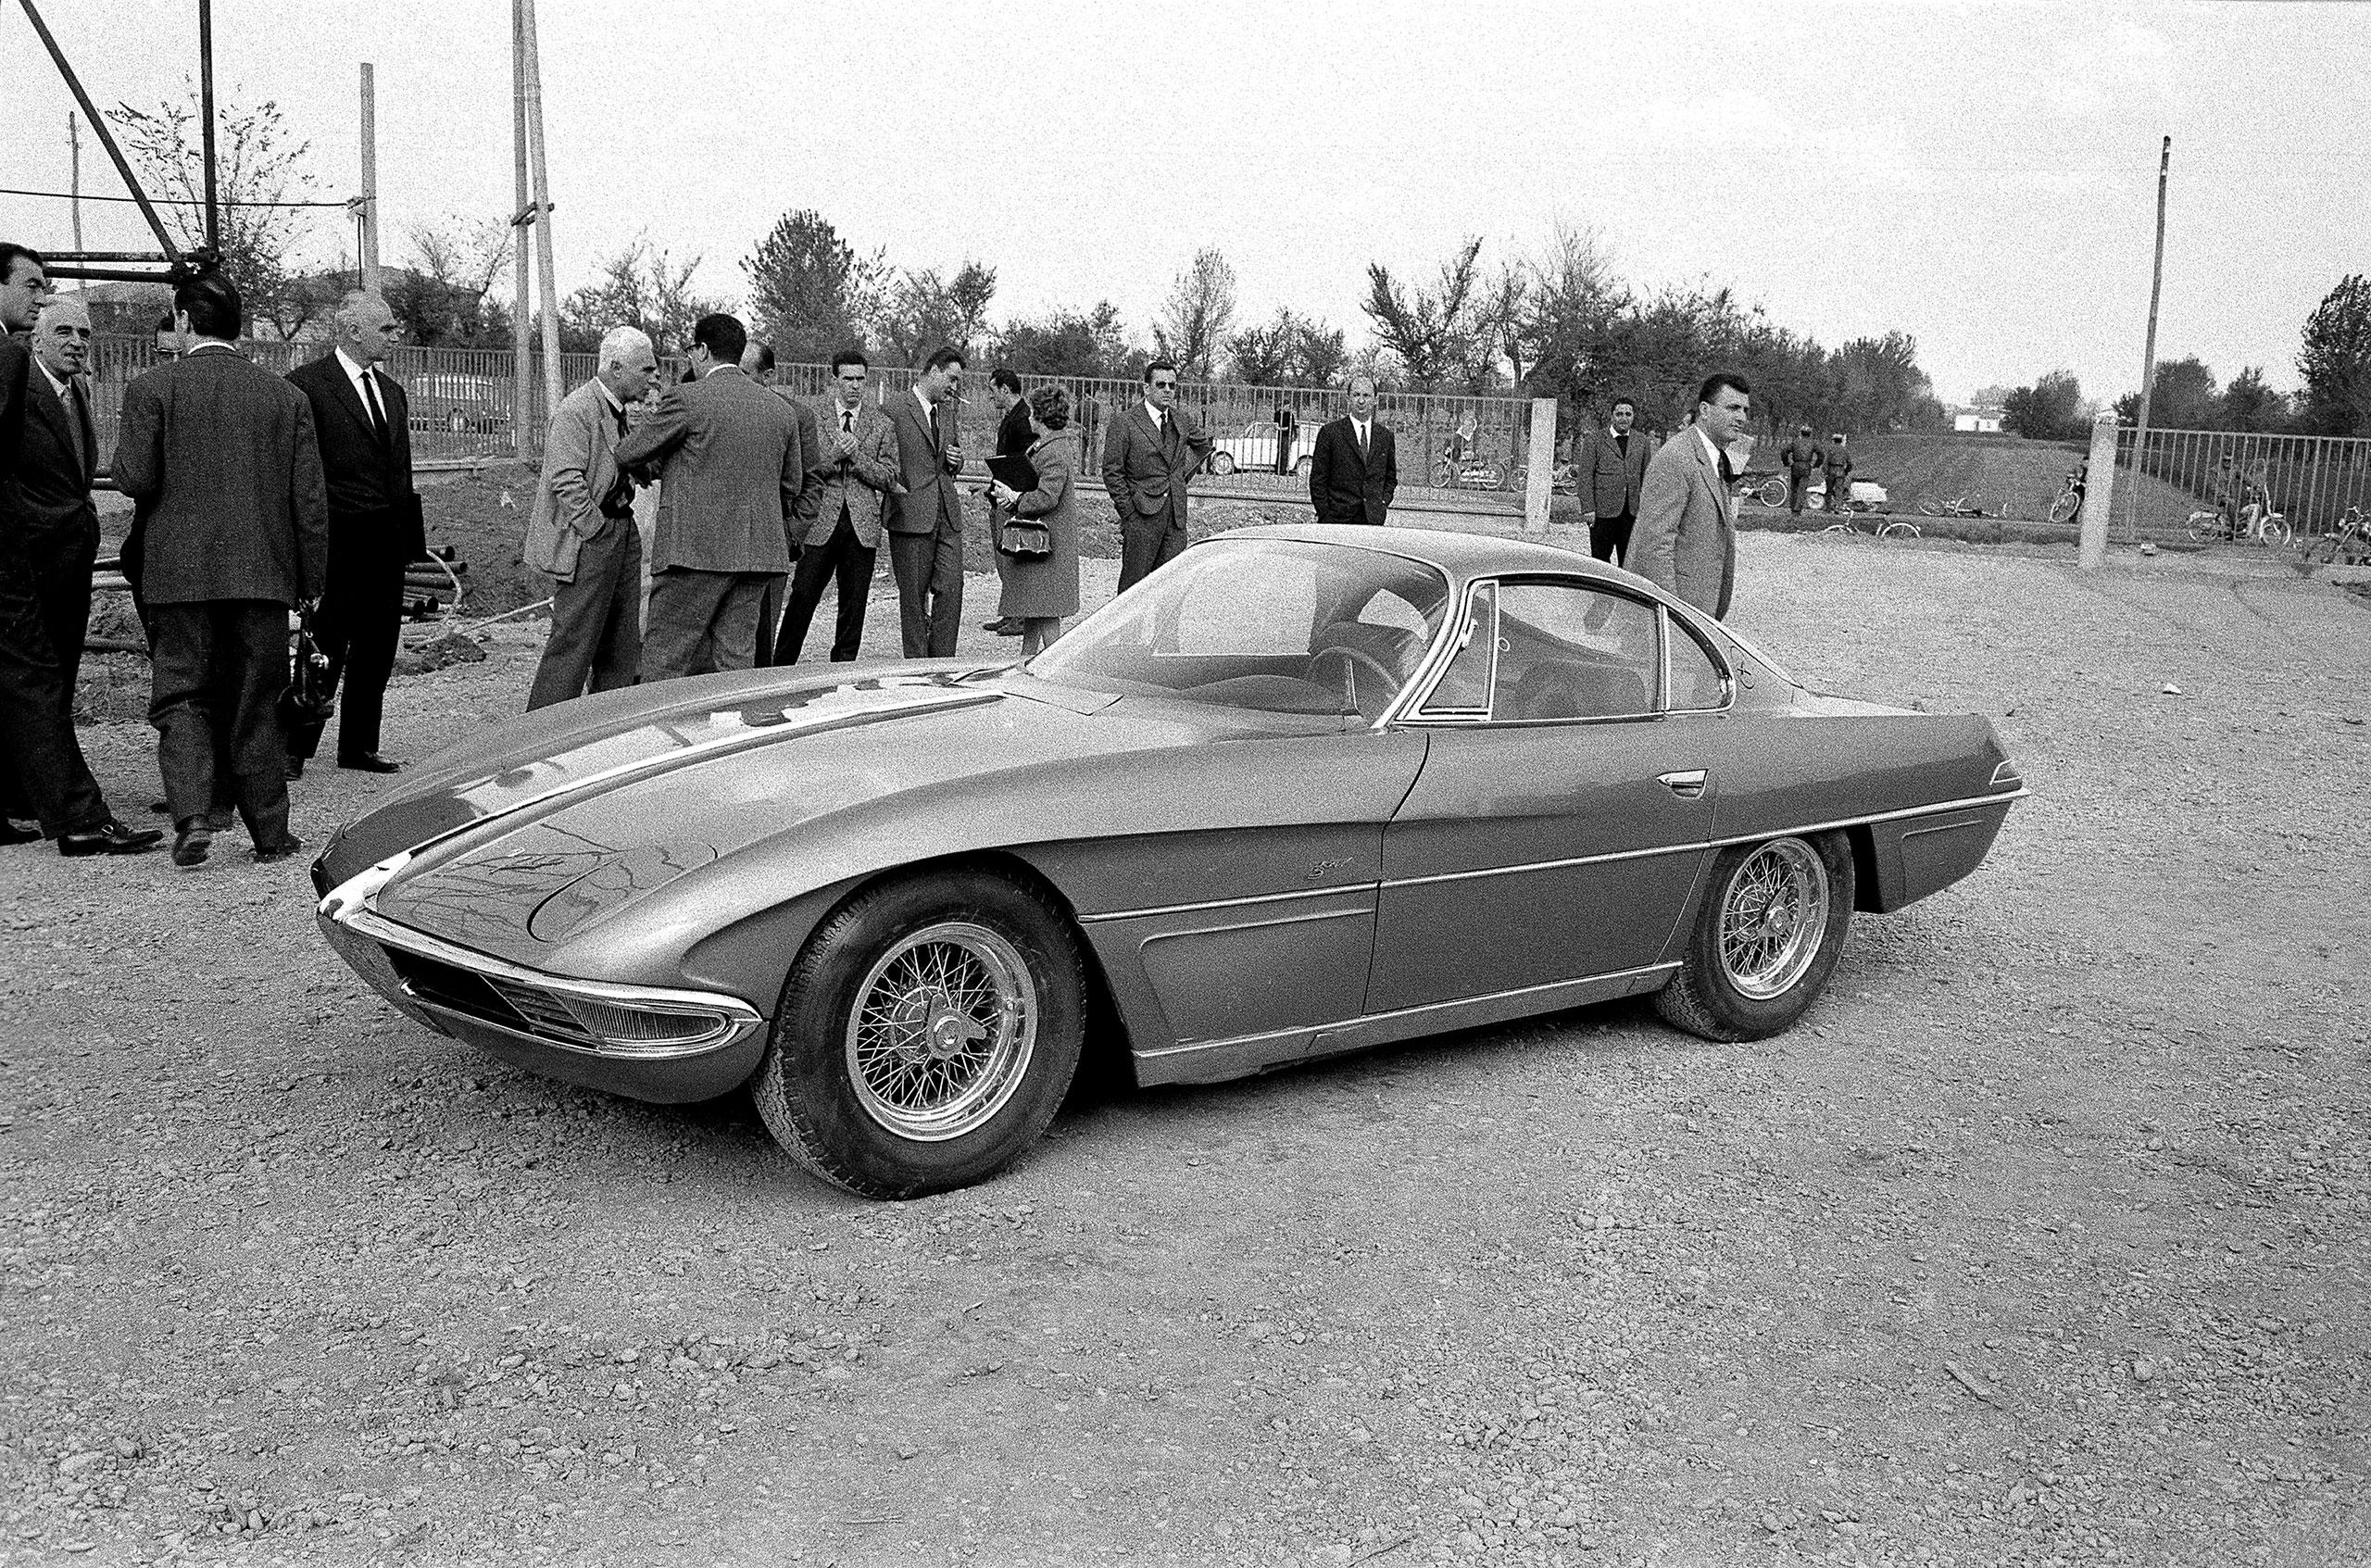 The launch of the new Lamborghini 350GTV with body by Franco Scaglione at the Lamborghini Factory, Sant'Agata, October 1963.